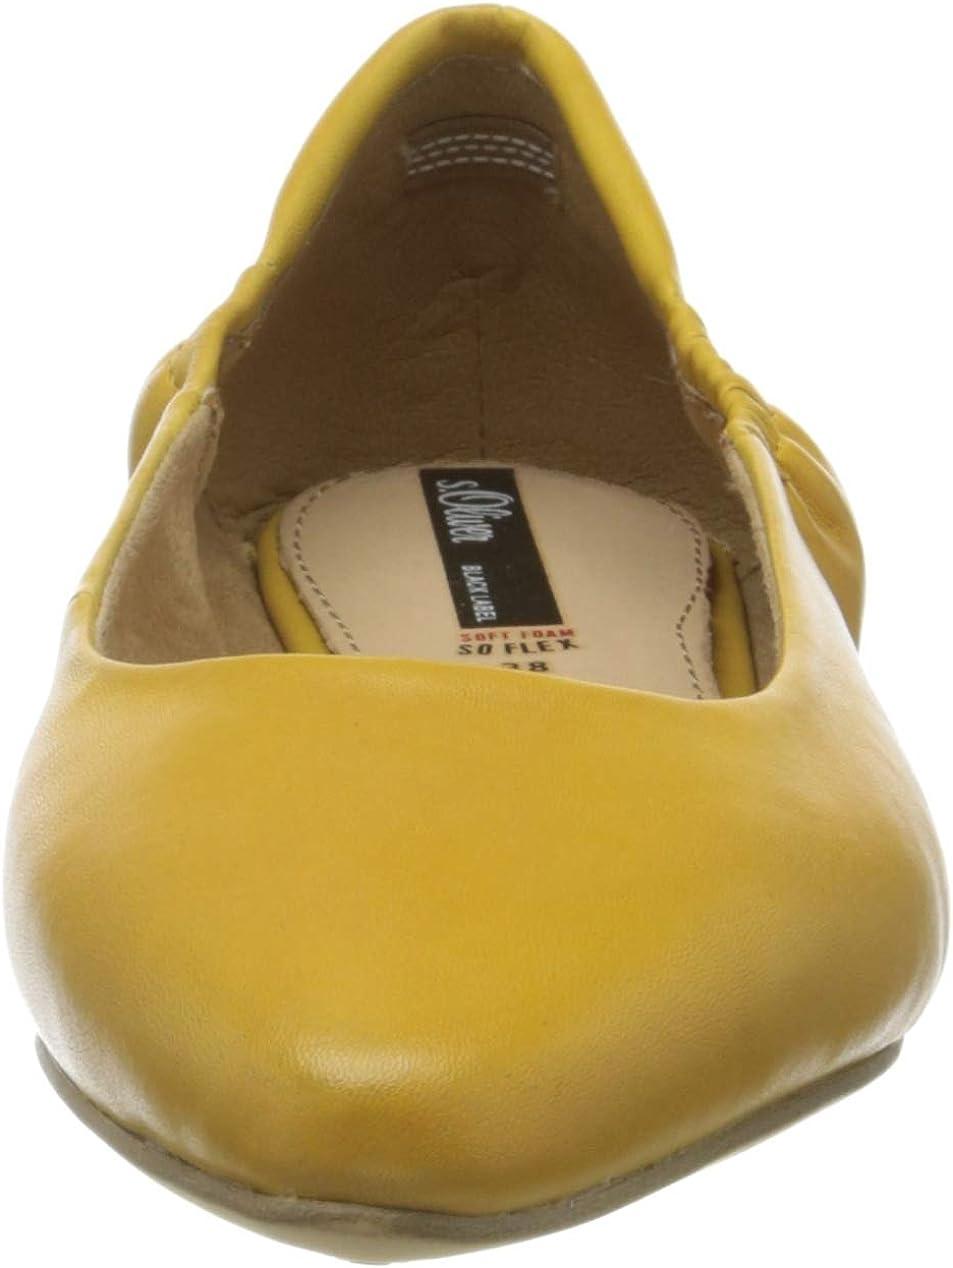 s.Oliver Damen 5-5-22101-24 Geschlossene Ballerinas Gelb Saffron 601 dIWFe